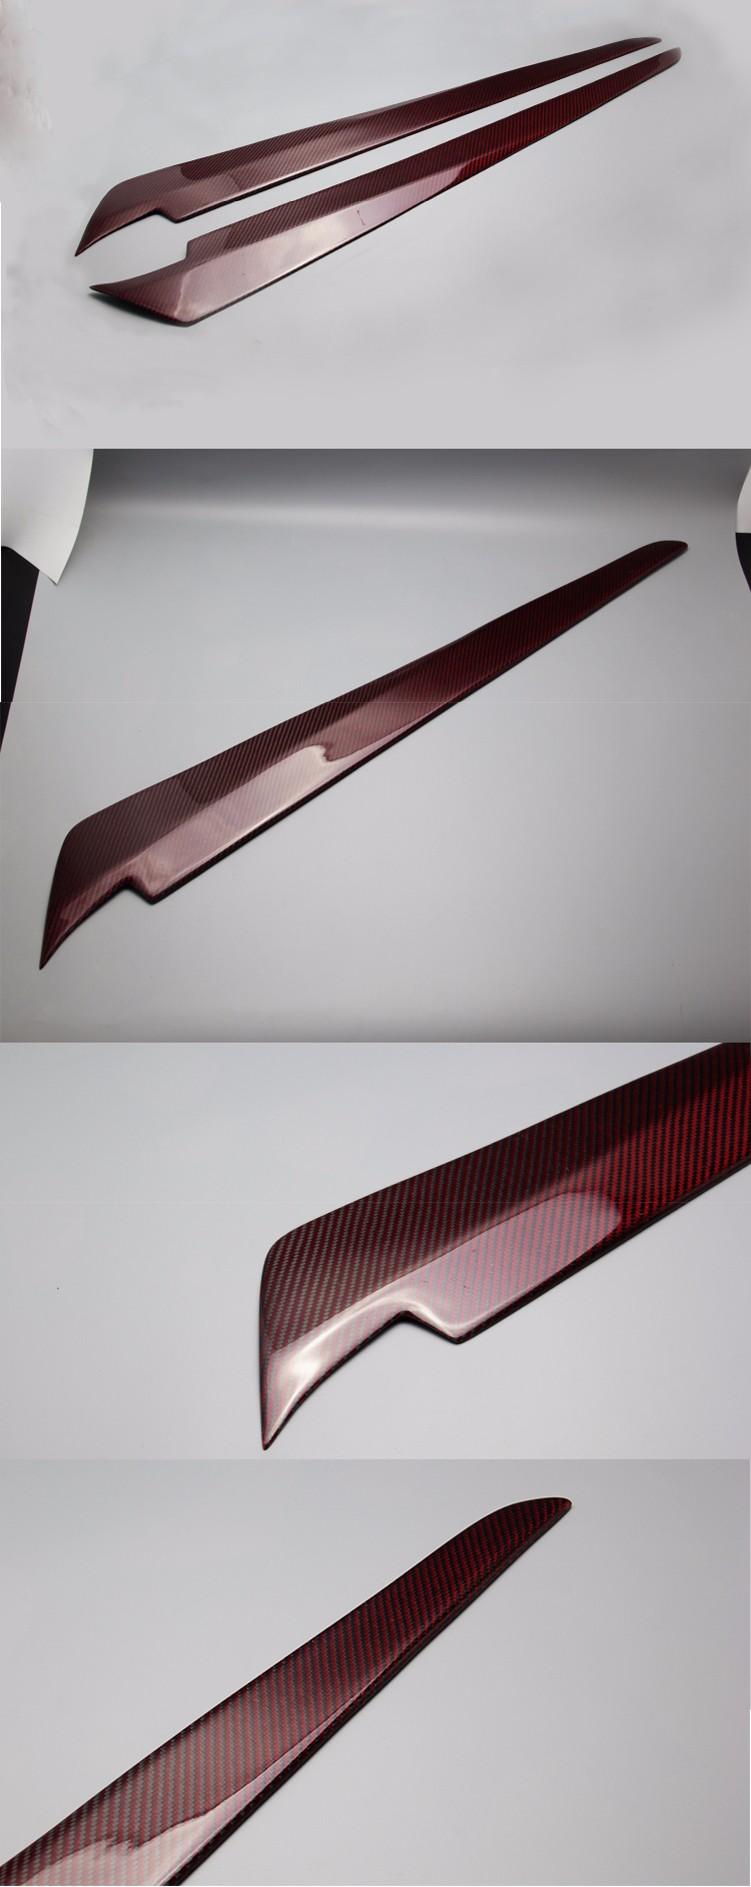 Toyota hiace kdh 200 2005 16 carbon fiber window front door garnish knife strip cover